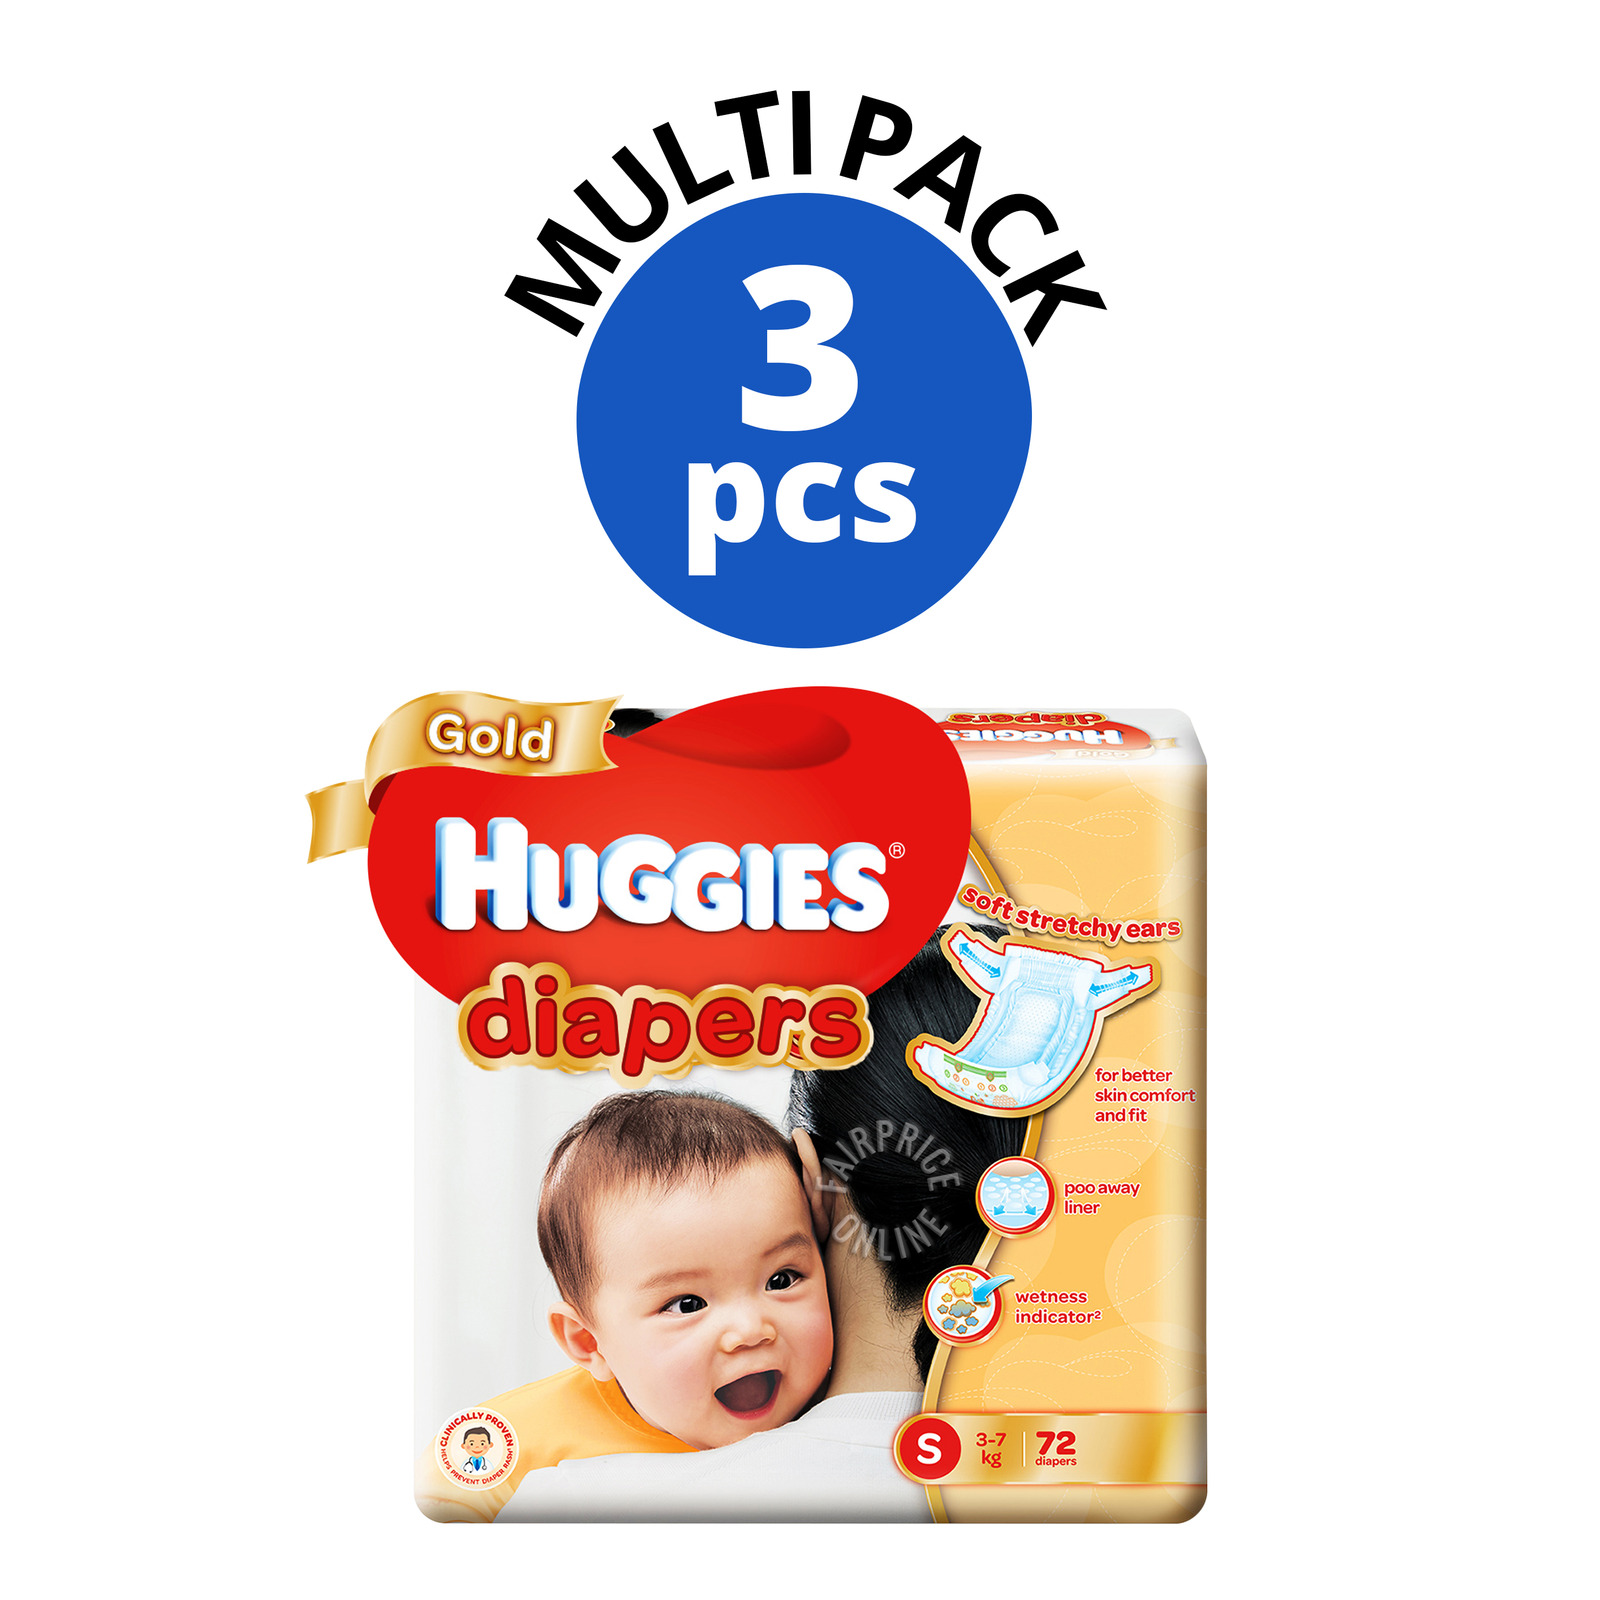 Huggies Gold Diapers - S (3 - 7kg)